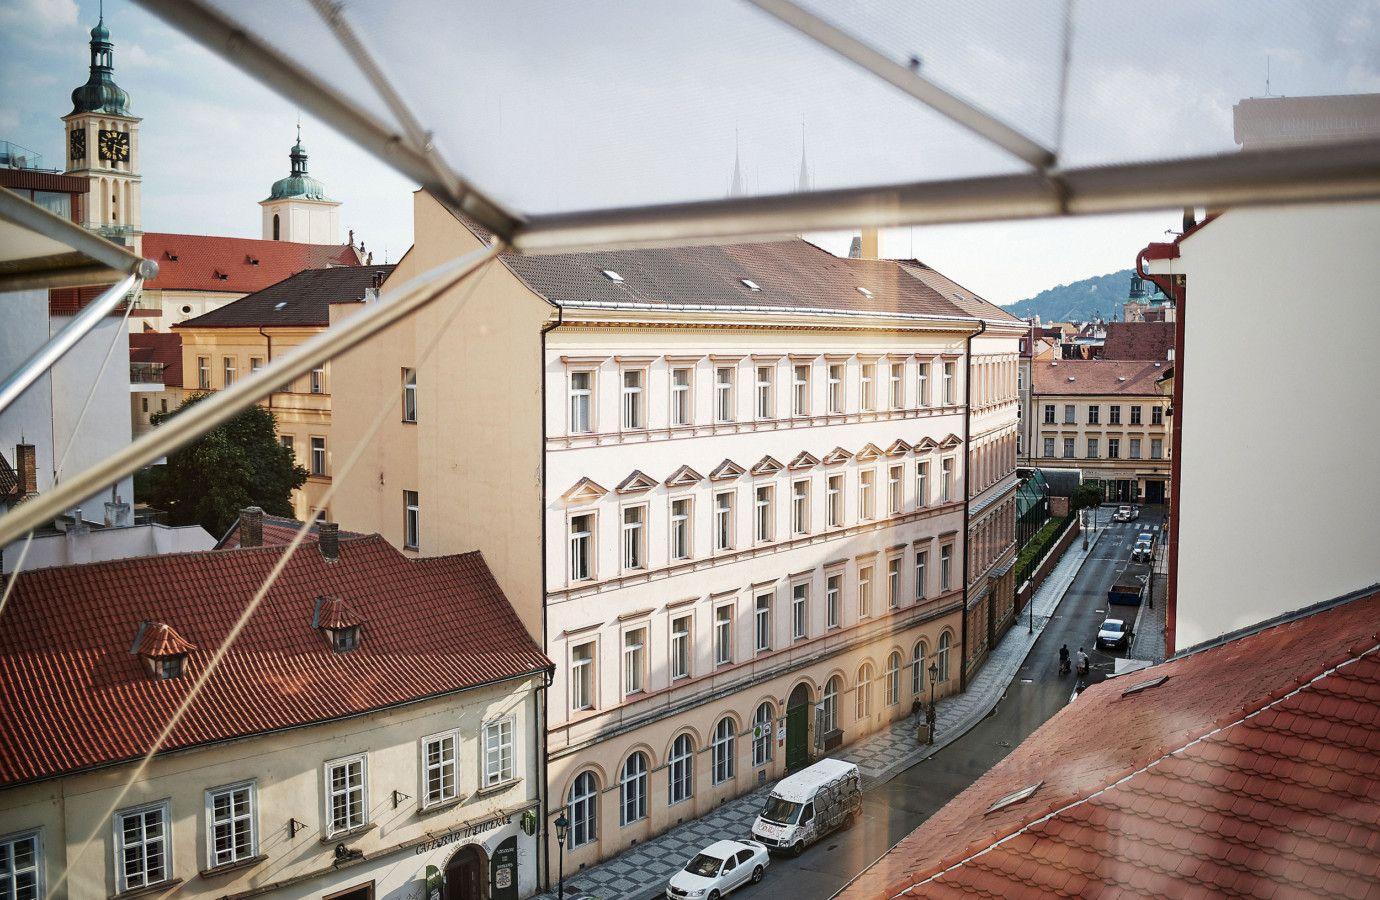 Hotel Josef Design Hotel In Prague S City Center Prague Hotels Prague City Hotel Josef Prague